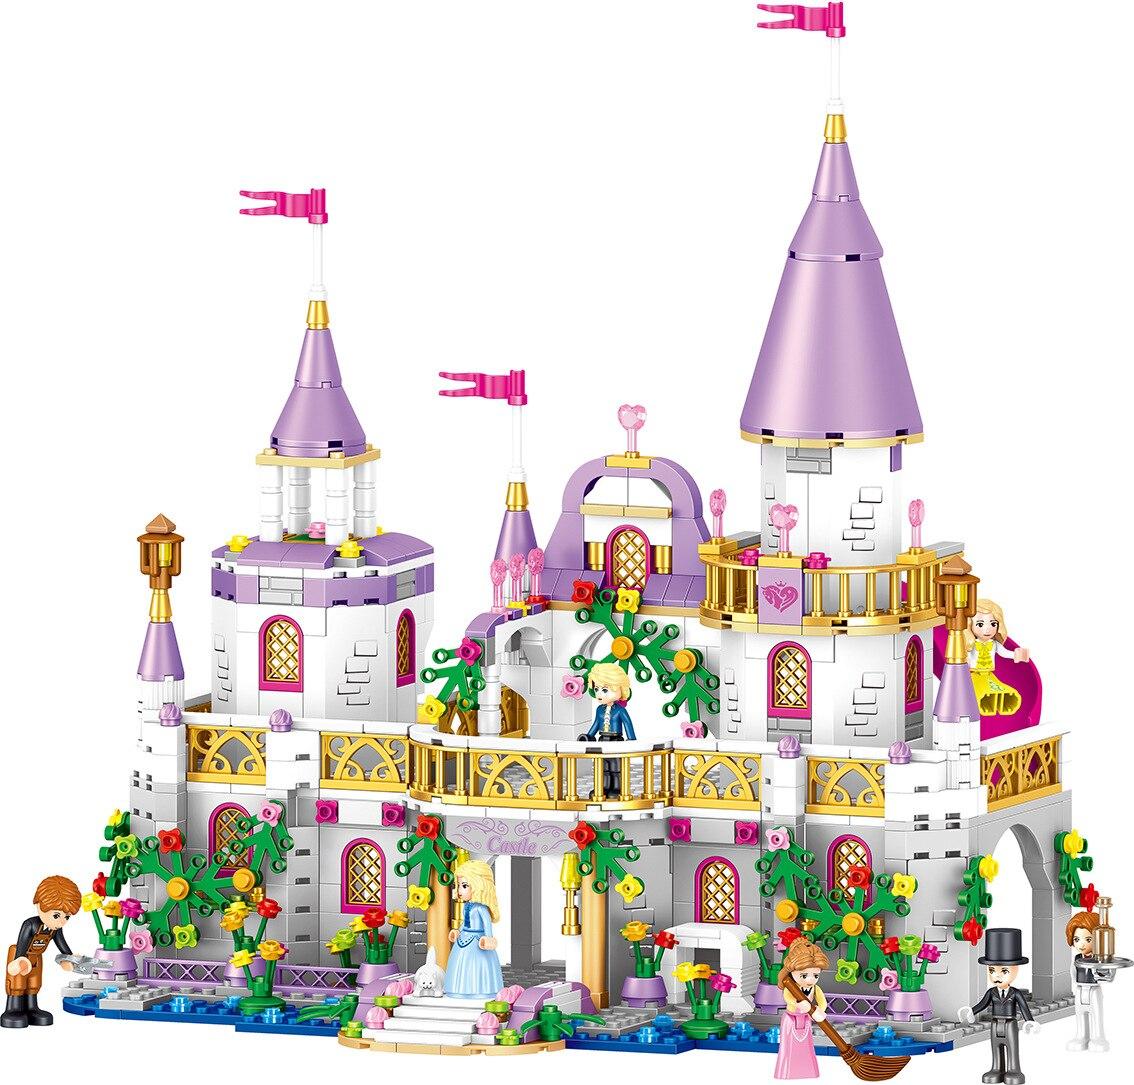 Girls Friends QL1106 731PCS Building Blocks Princess Windsor Castle Bricks Compatible Legoing 41148 Toys for Girl Christmas Gift